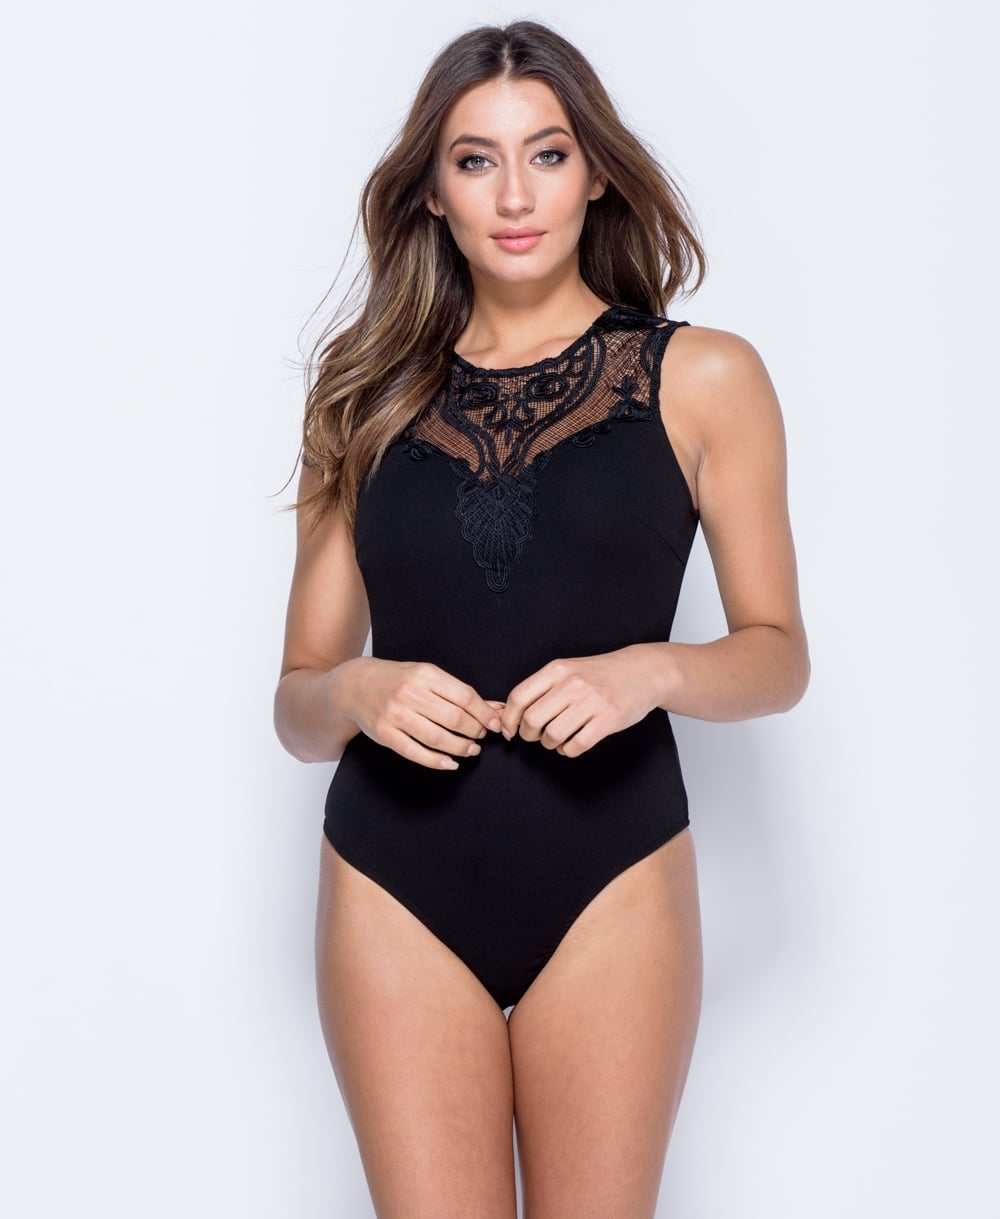 5142dd9be8d Tops-Κορμάκια-Μπλούζες | Sexy Κορμάκι ελαστικό με δαντέλα